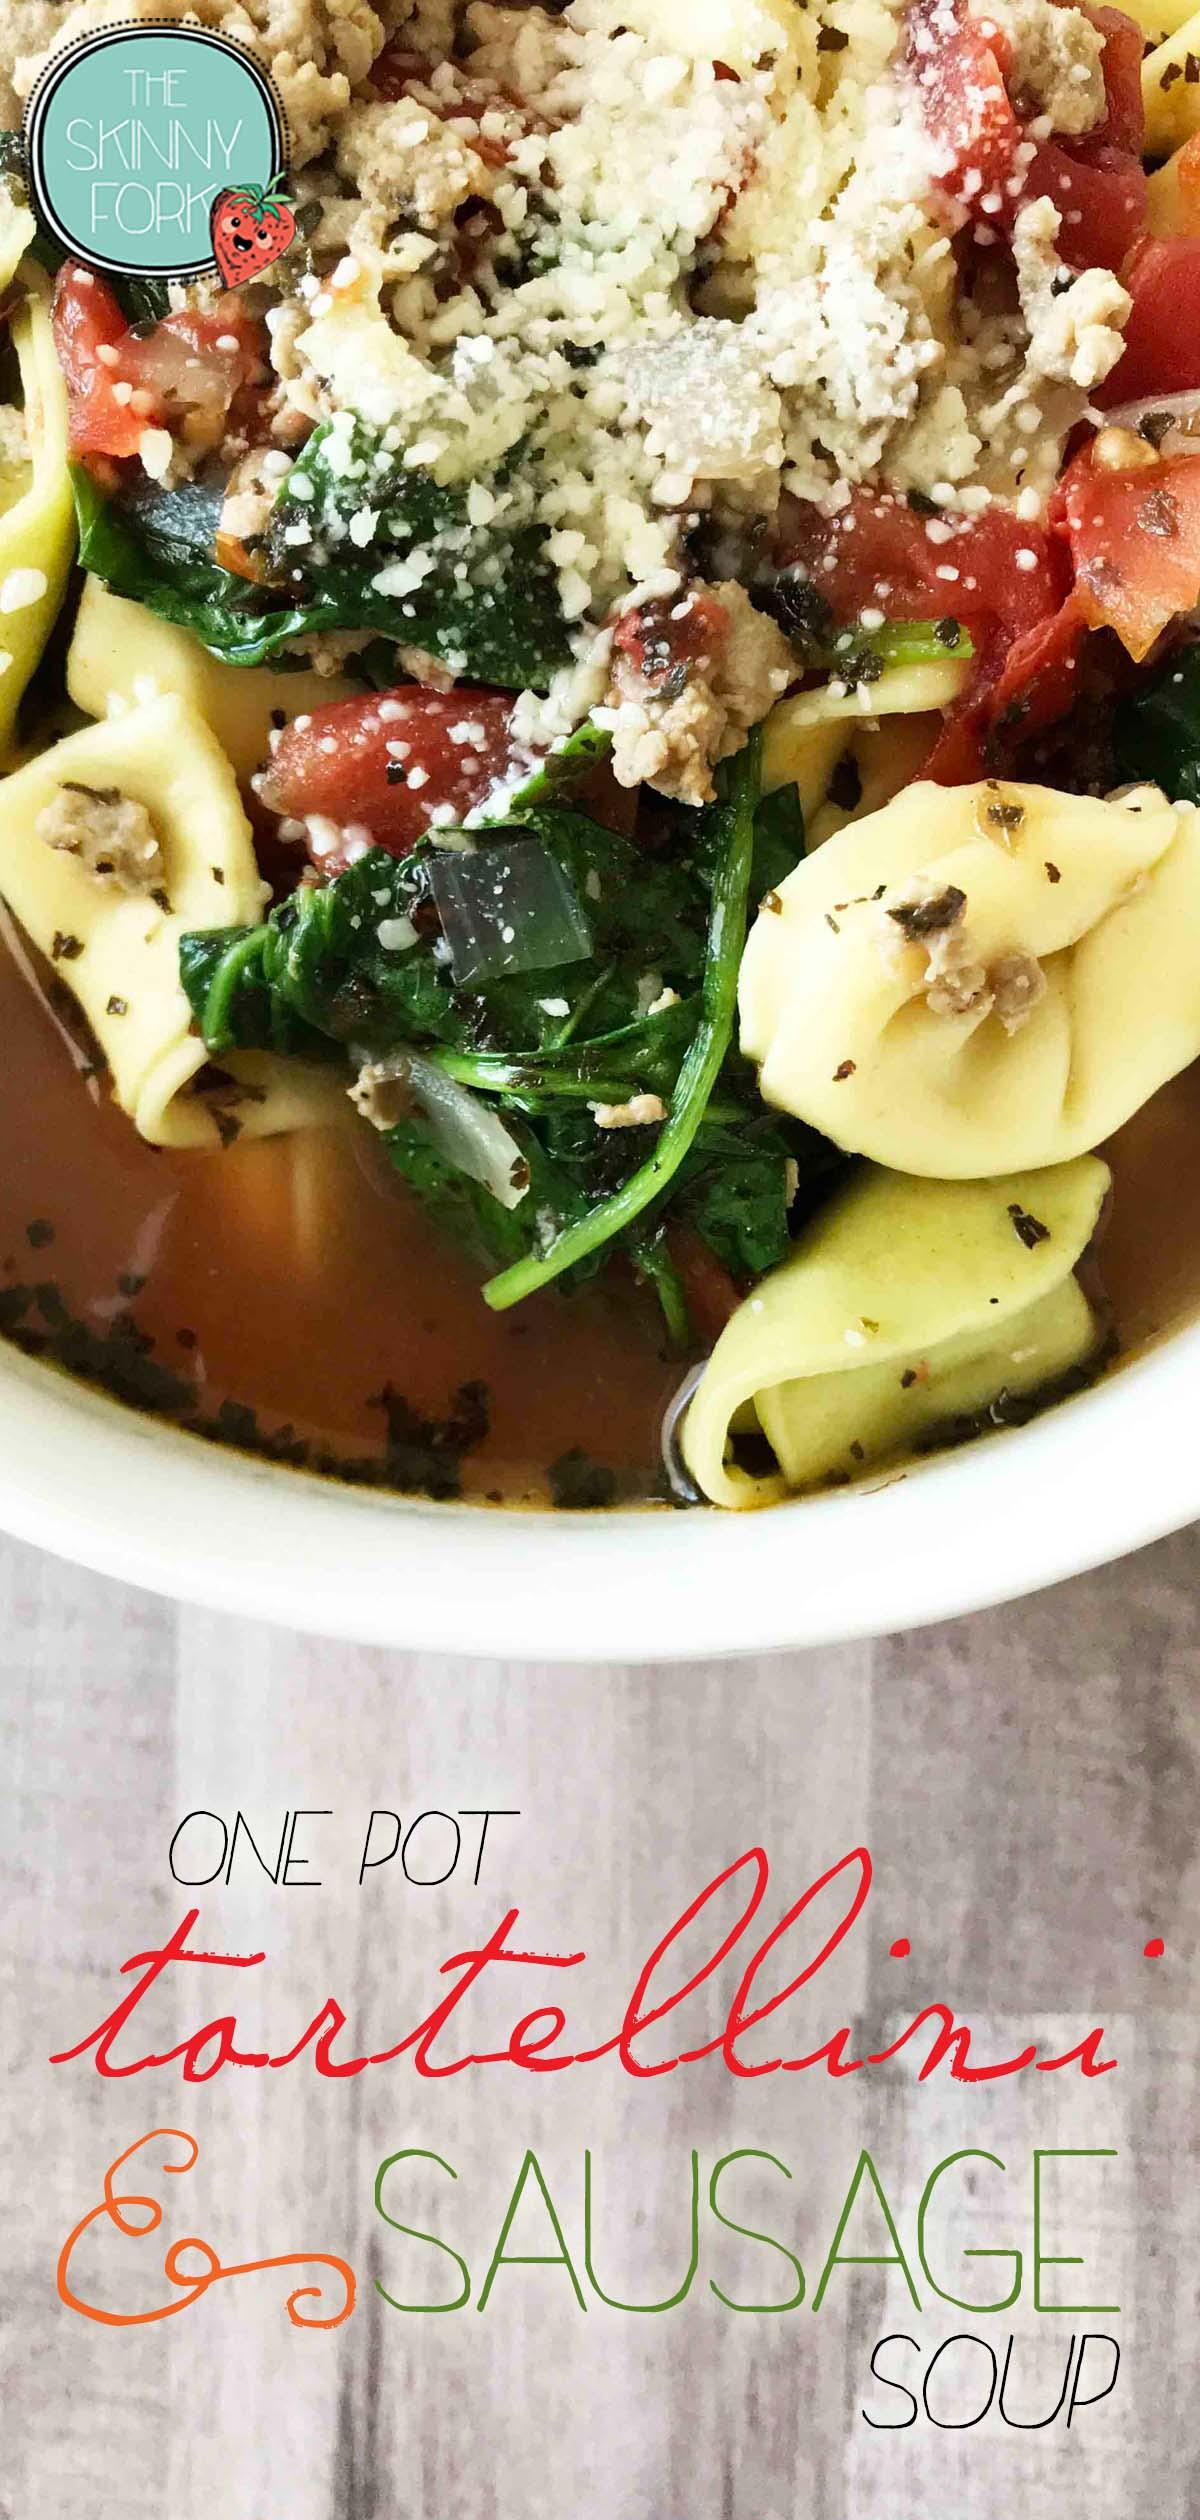 'One Pot' Tortellini & Sausage Soup